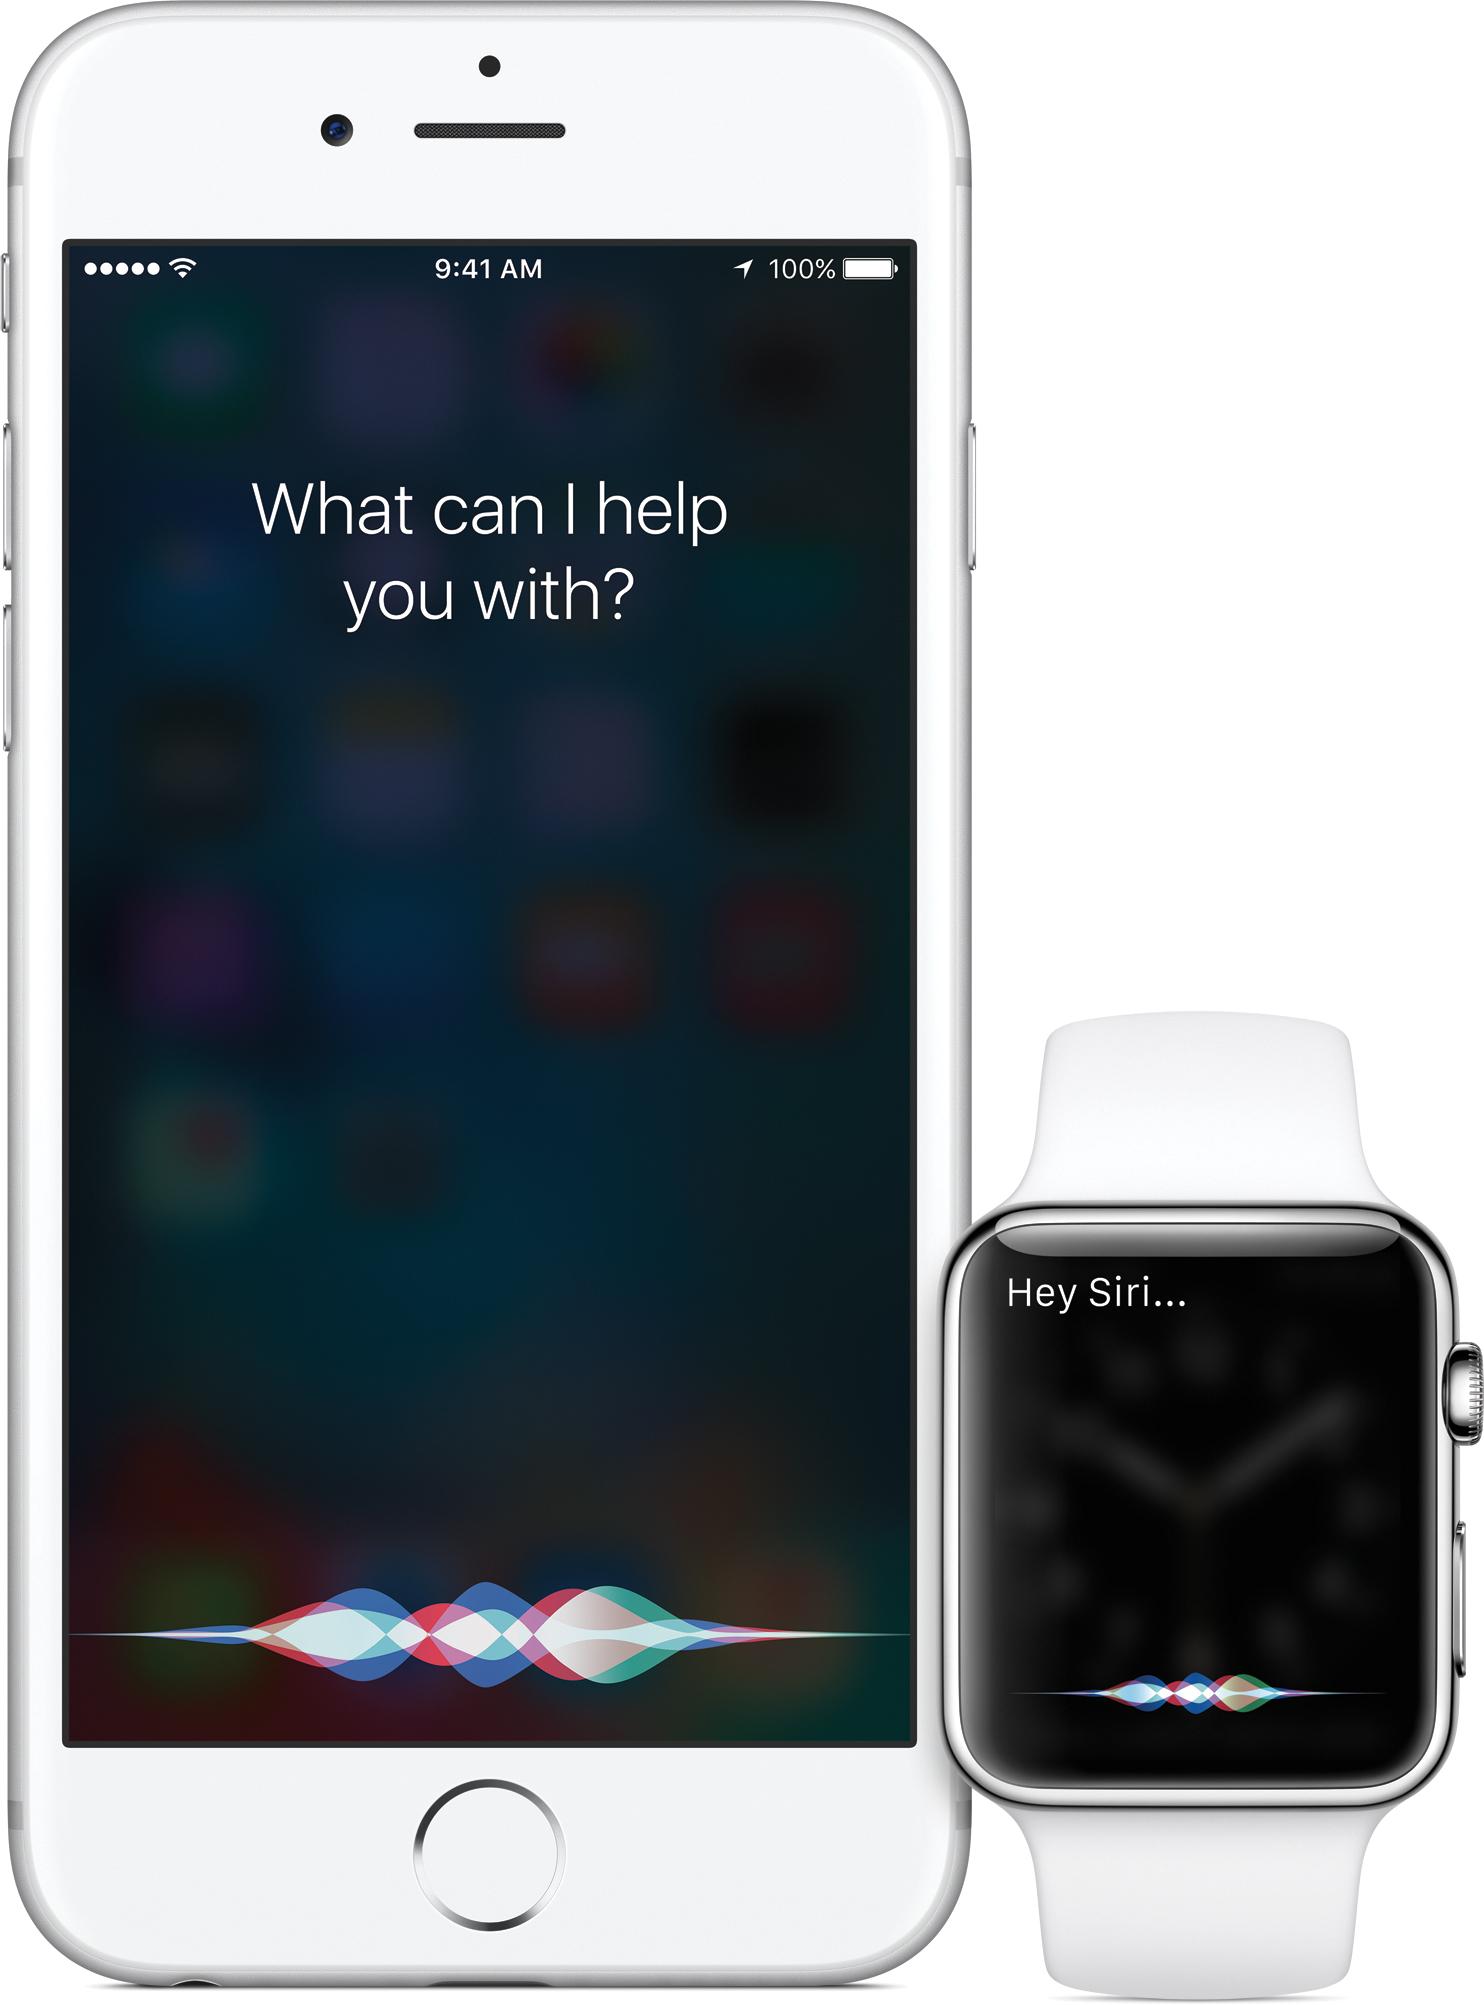 Siri iPhone'is iOS 9 ja watchOS2 Apple Watchis